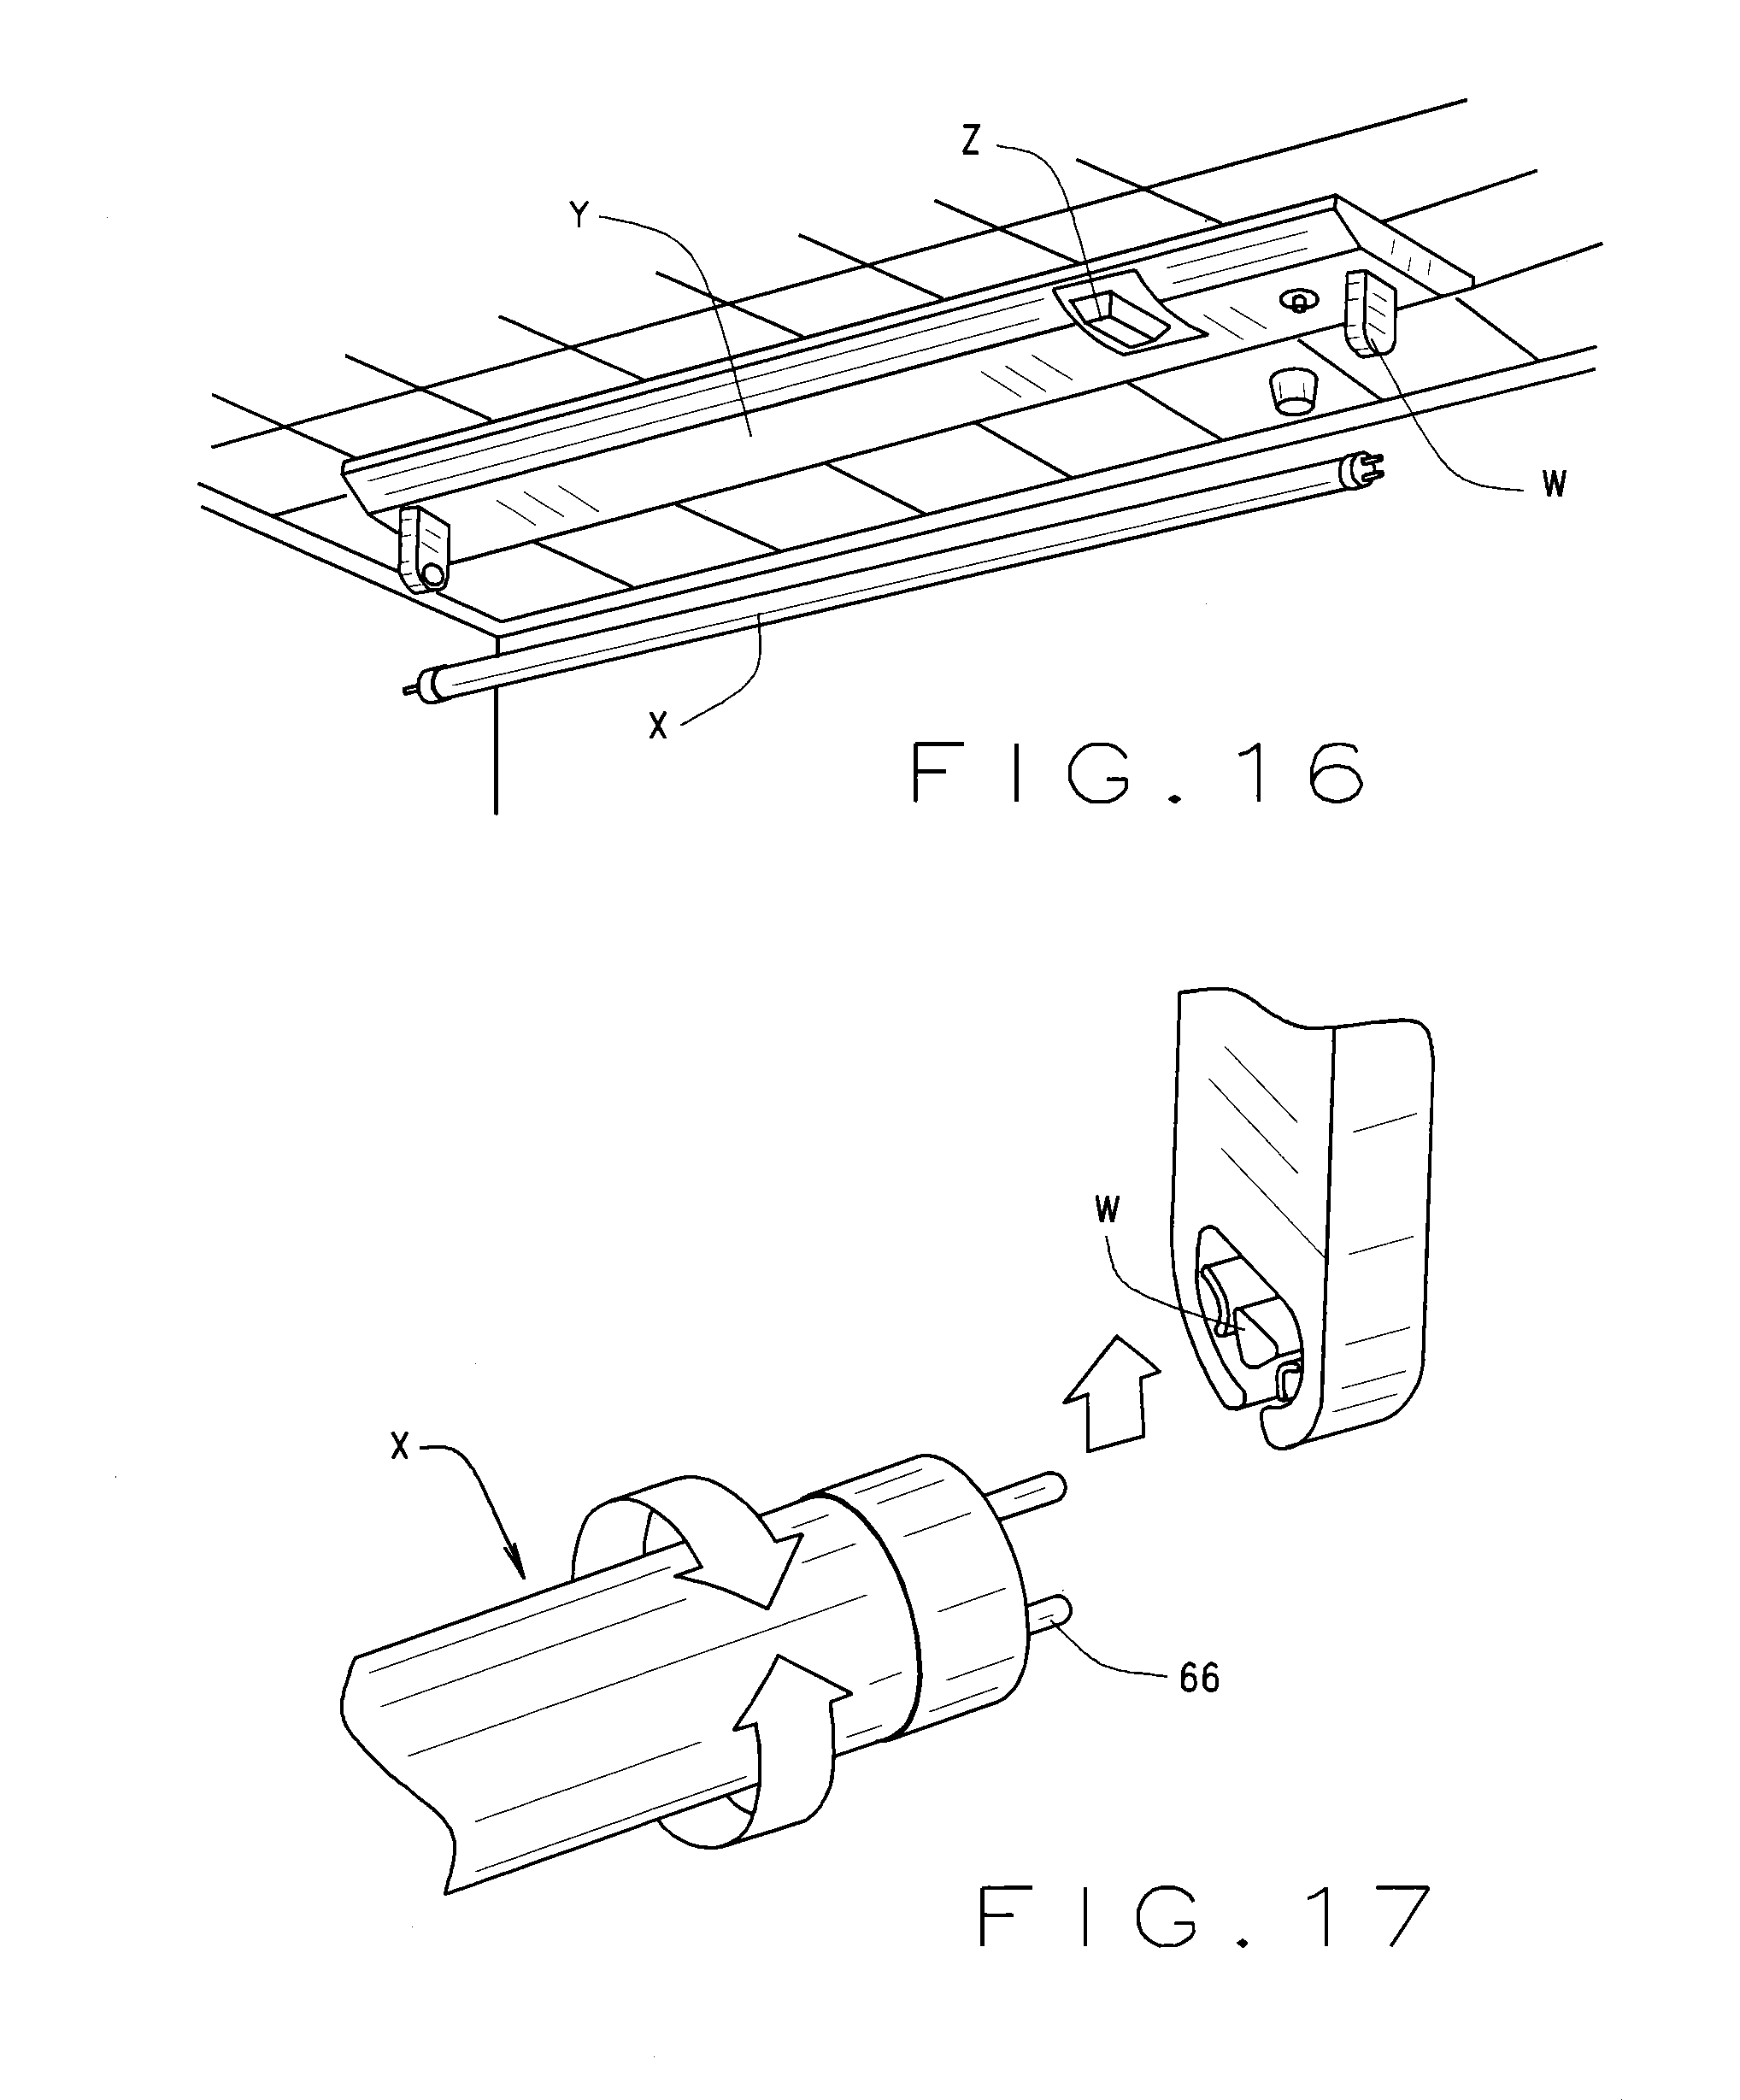 Hayward C48k2n143b1 Wiring Diagram Example Electrical Super Pump 220 Volt Get Pool Parts Pumps Model